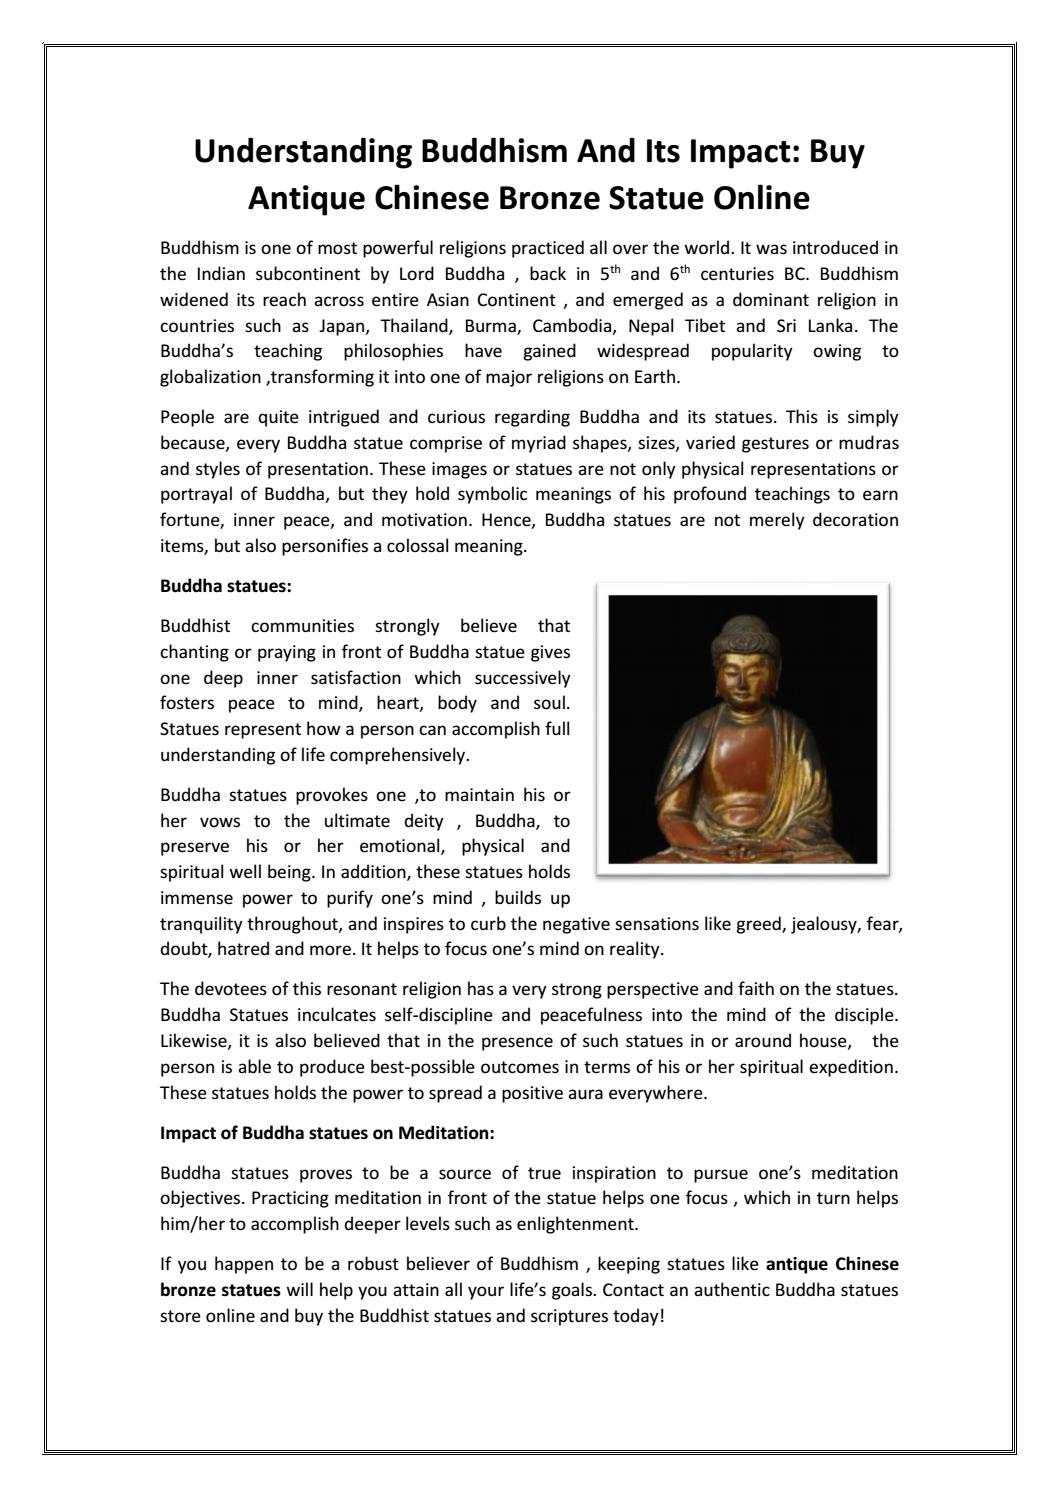 Understanding buddhism and its impact buy antique chinese bronze understanding buddhism and its impact buy antique chinese bronze statue online by miaasmith issuu biocorpaavc Choice Image